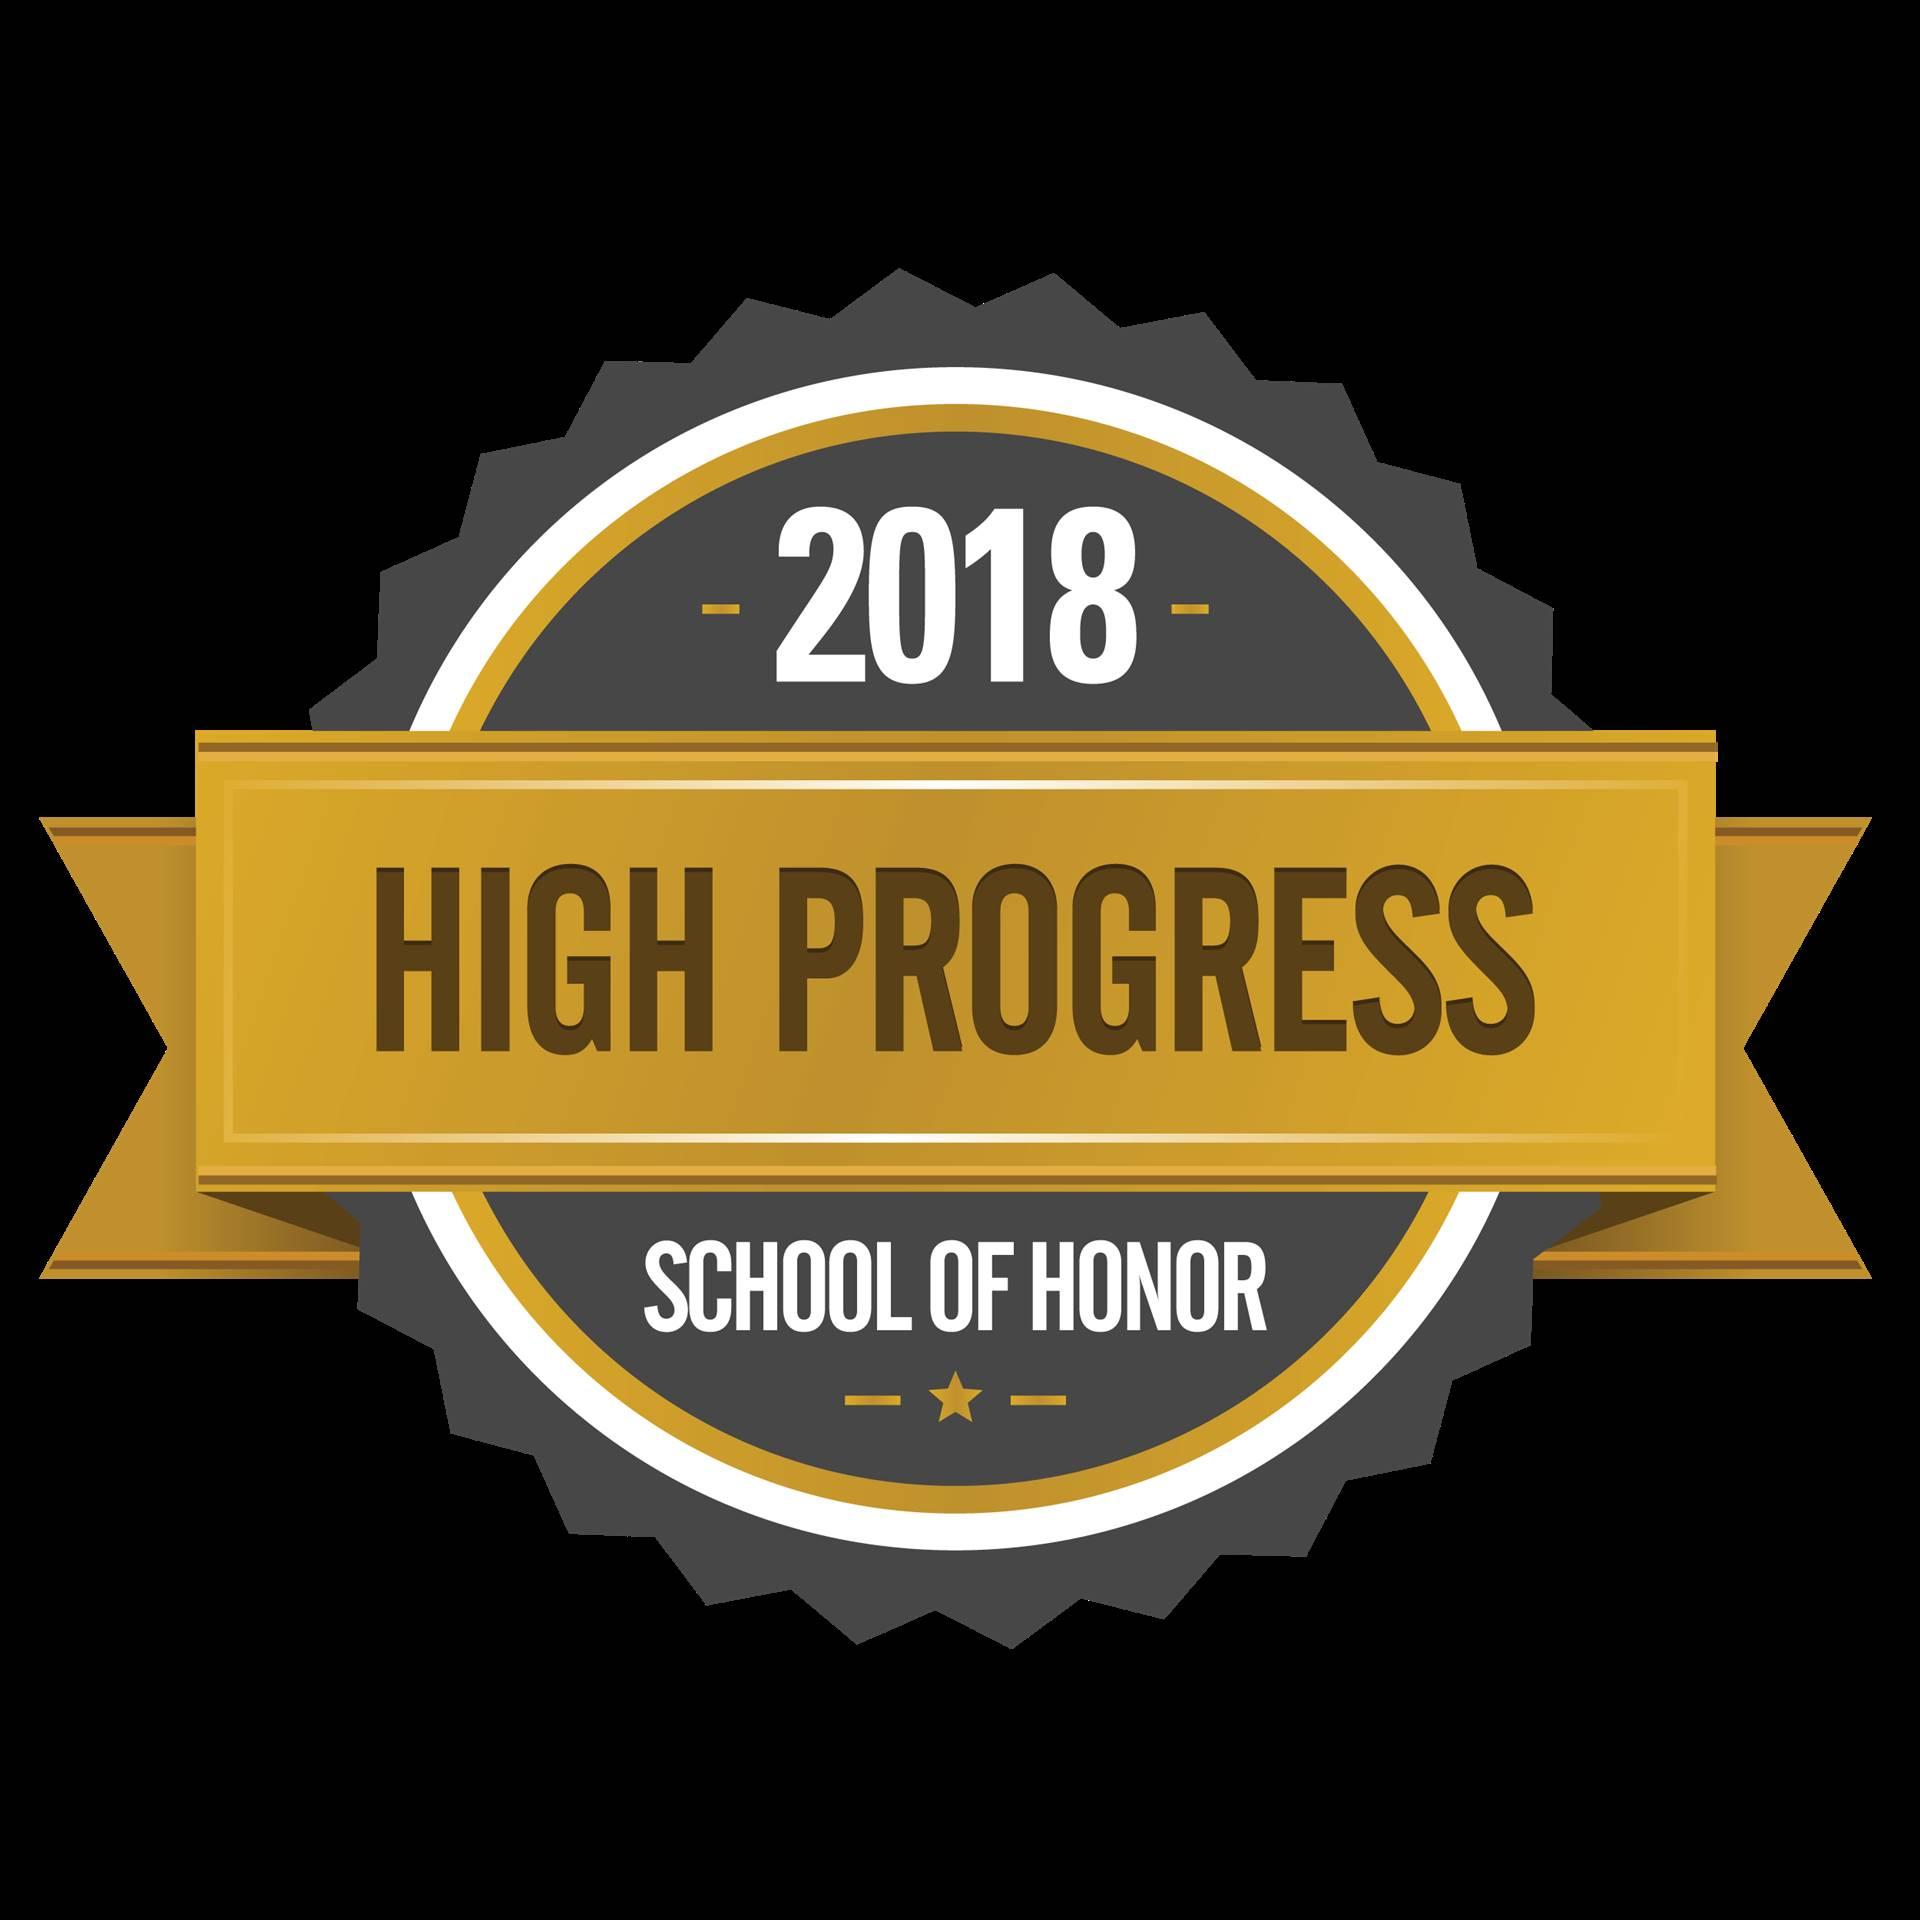 2018 High Progress School of Honor - award by ODE